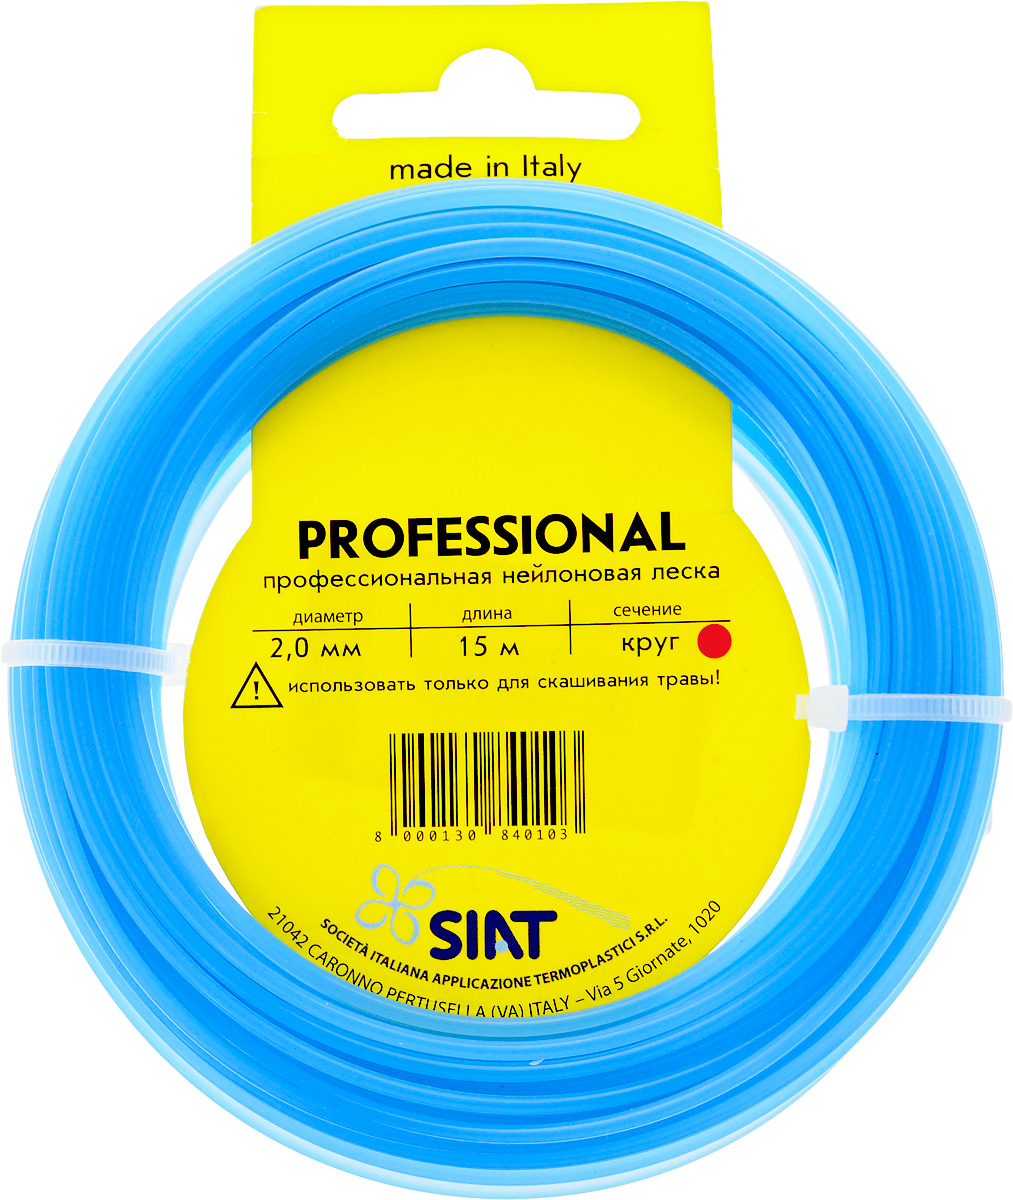 Леска для триммера Siat Professional Siat. Круг, диаметр 2 мм, длина 15 м леска для триммера oregon blue круг 3х15м